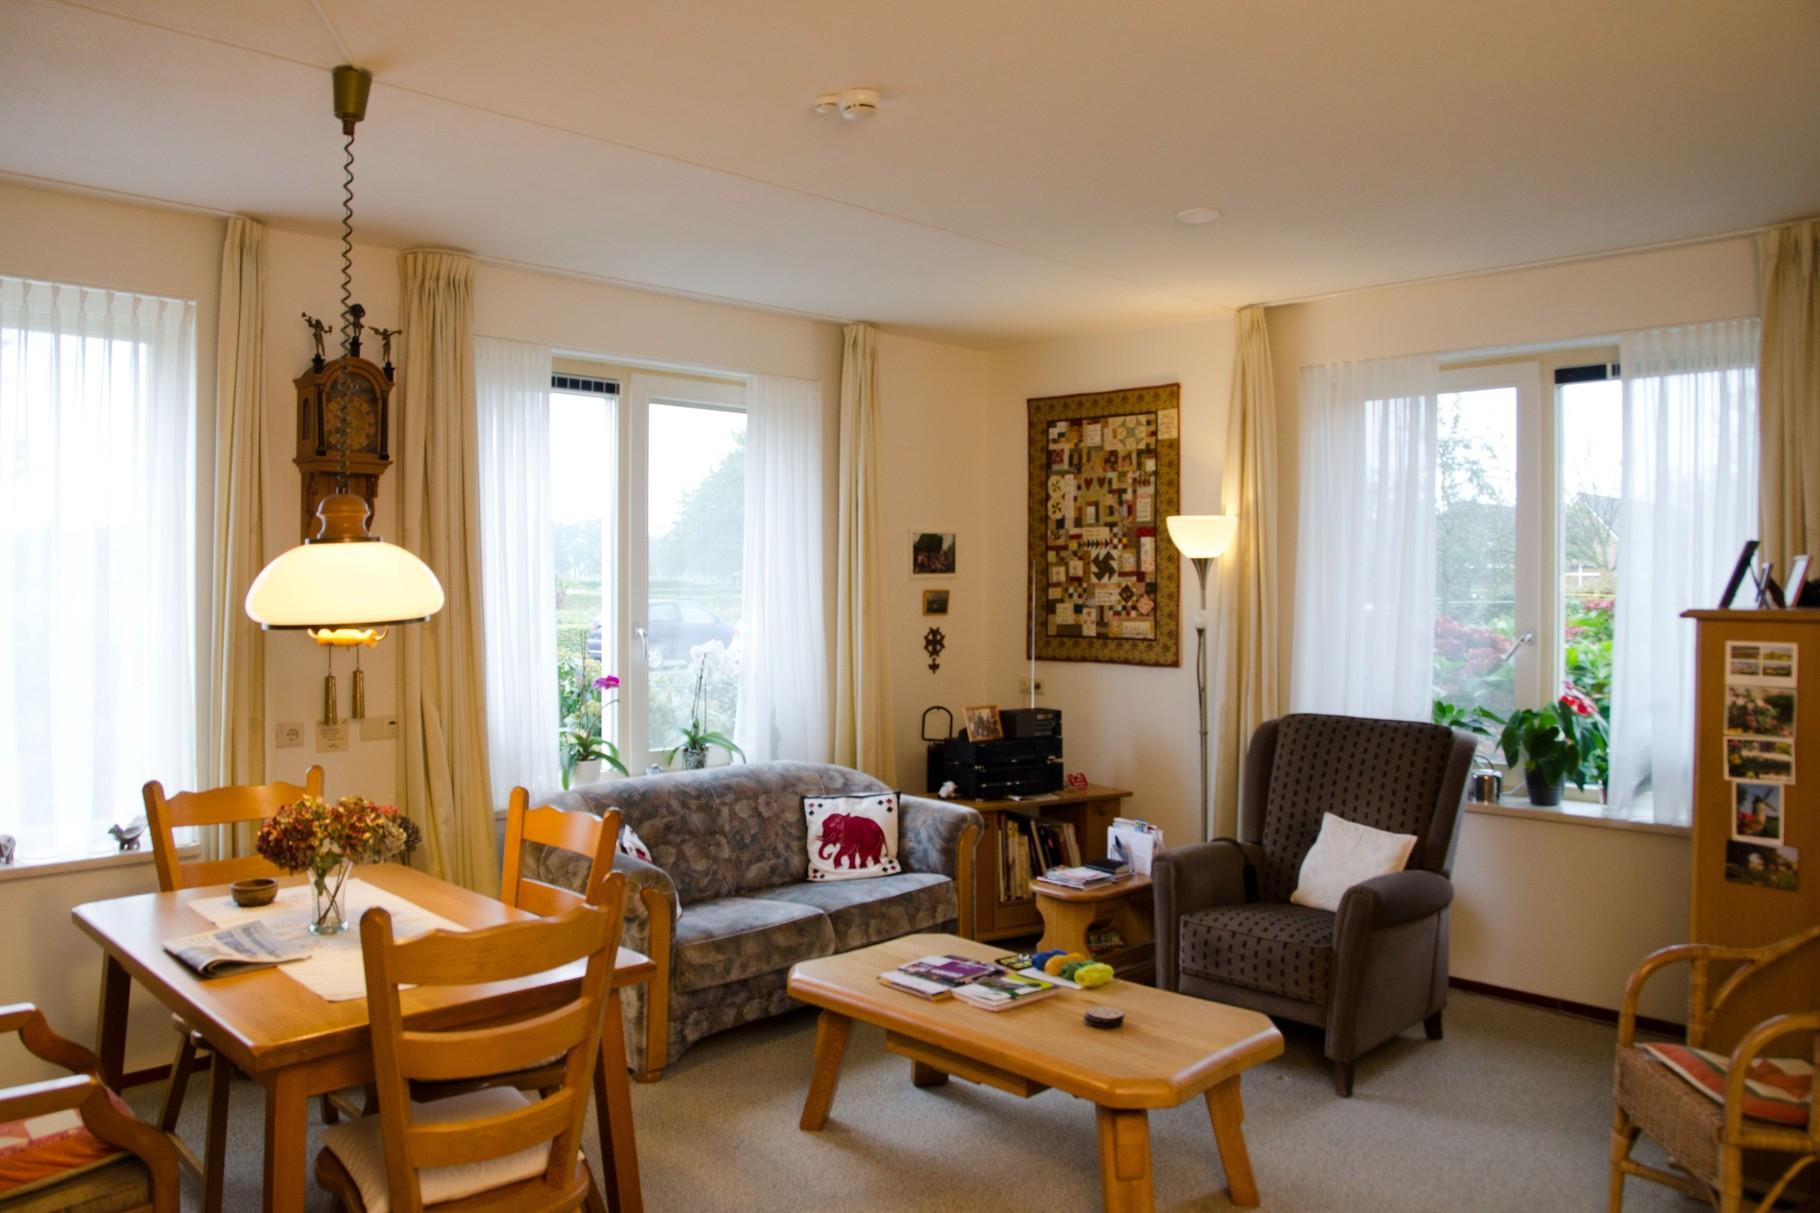 Zorgappartement woonkamer en keuken